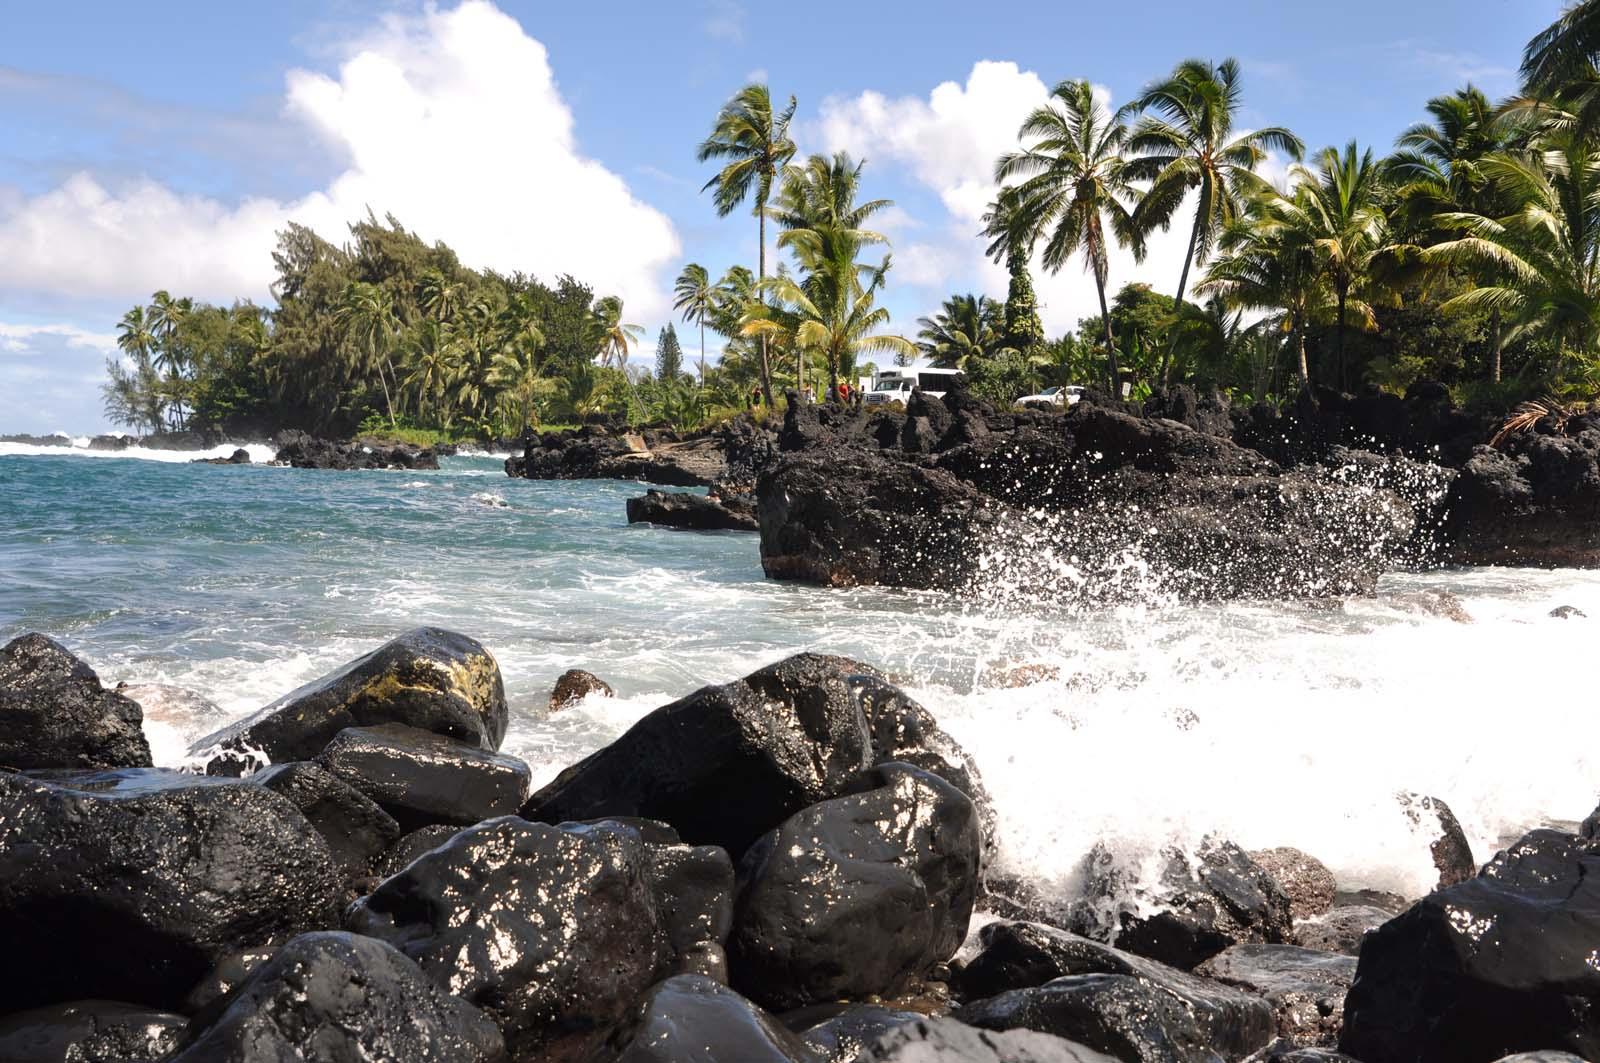 127_maui_hawaii_island